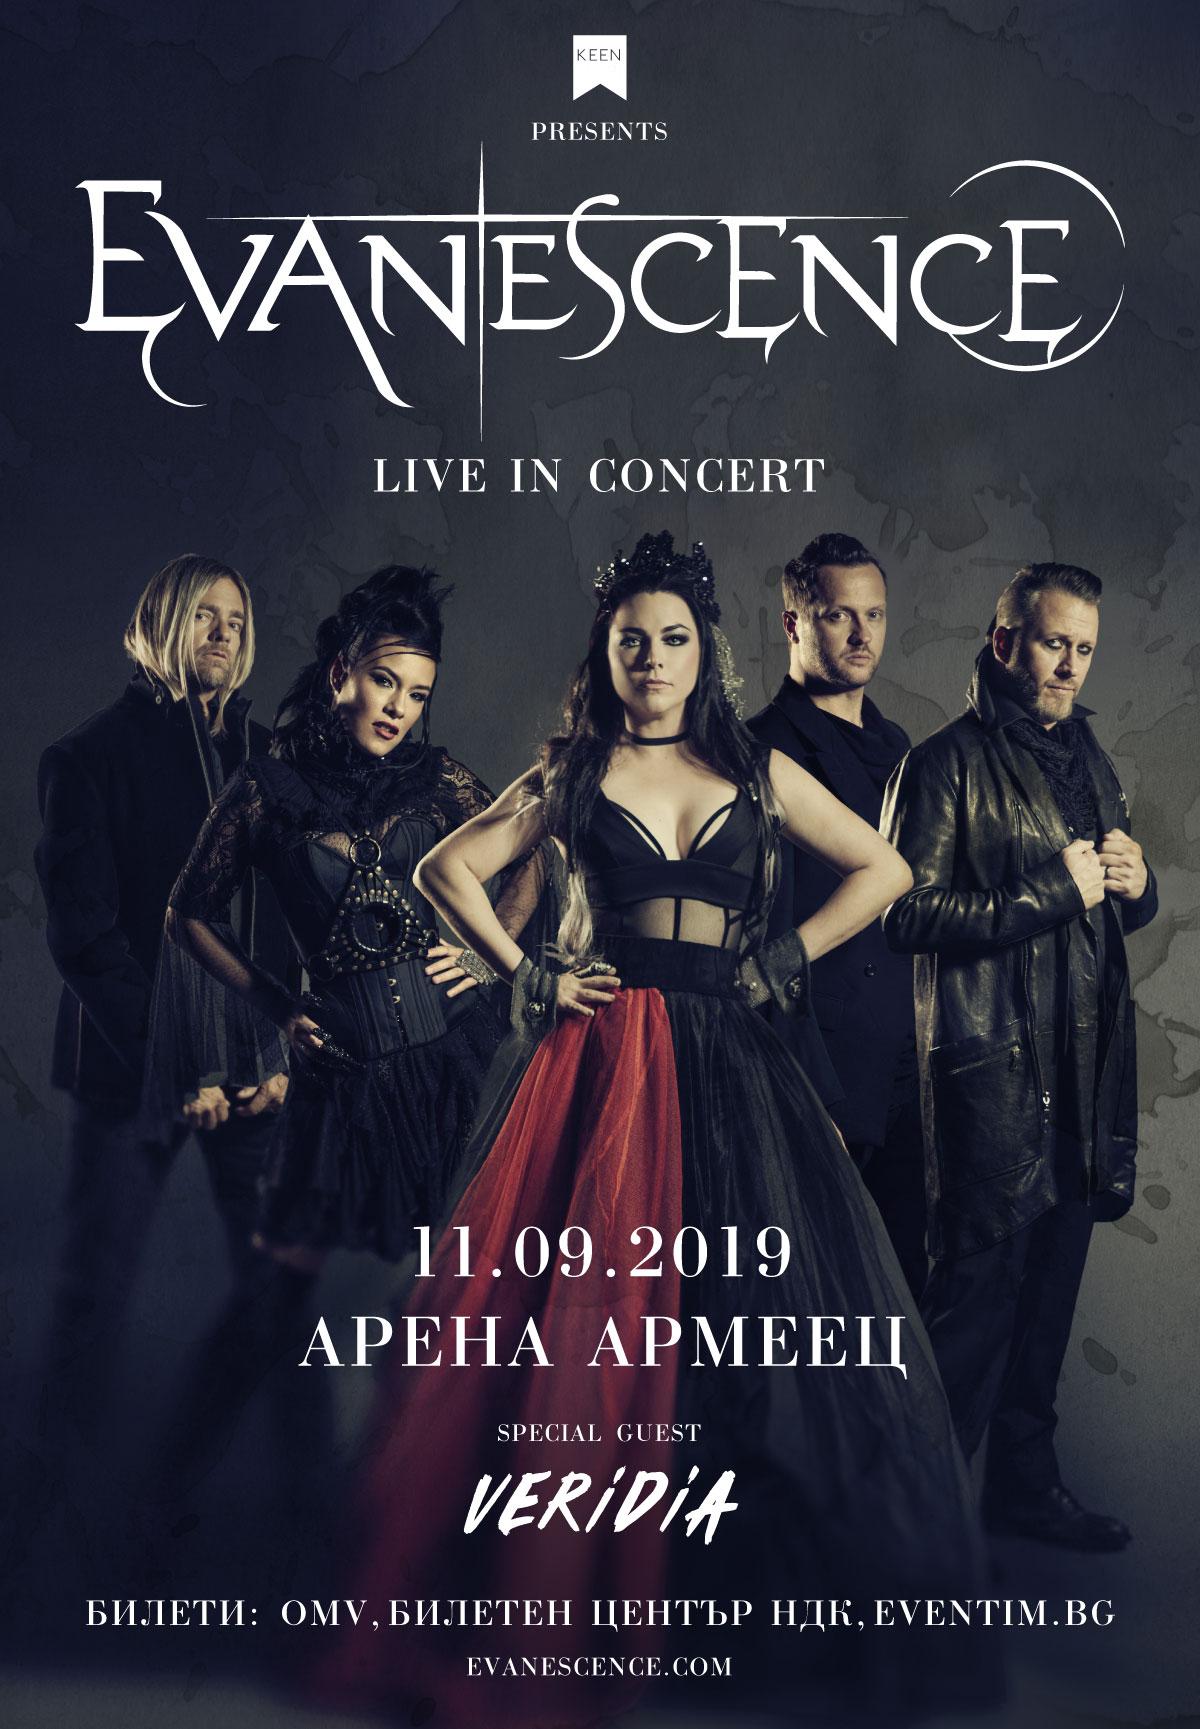 Evanescence_Poster_70x100_Veridia